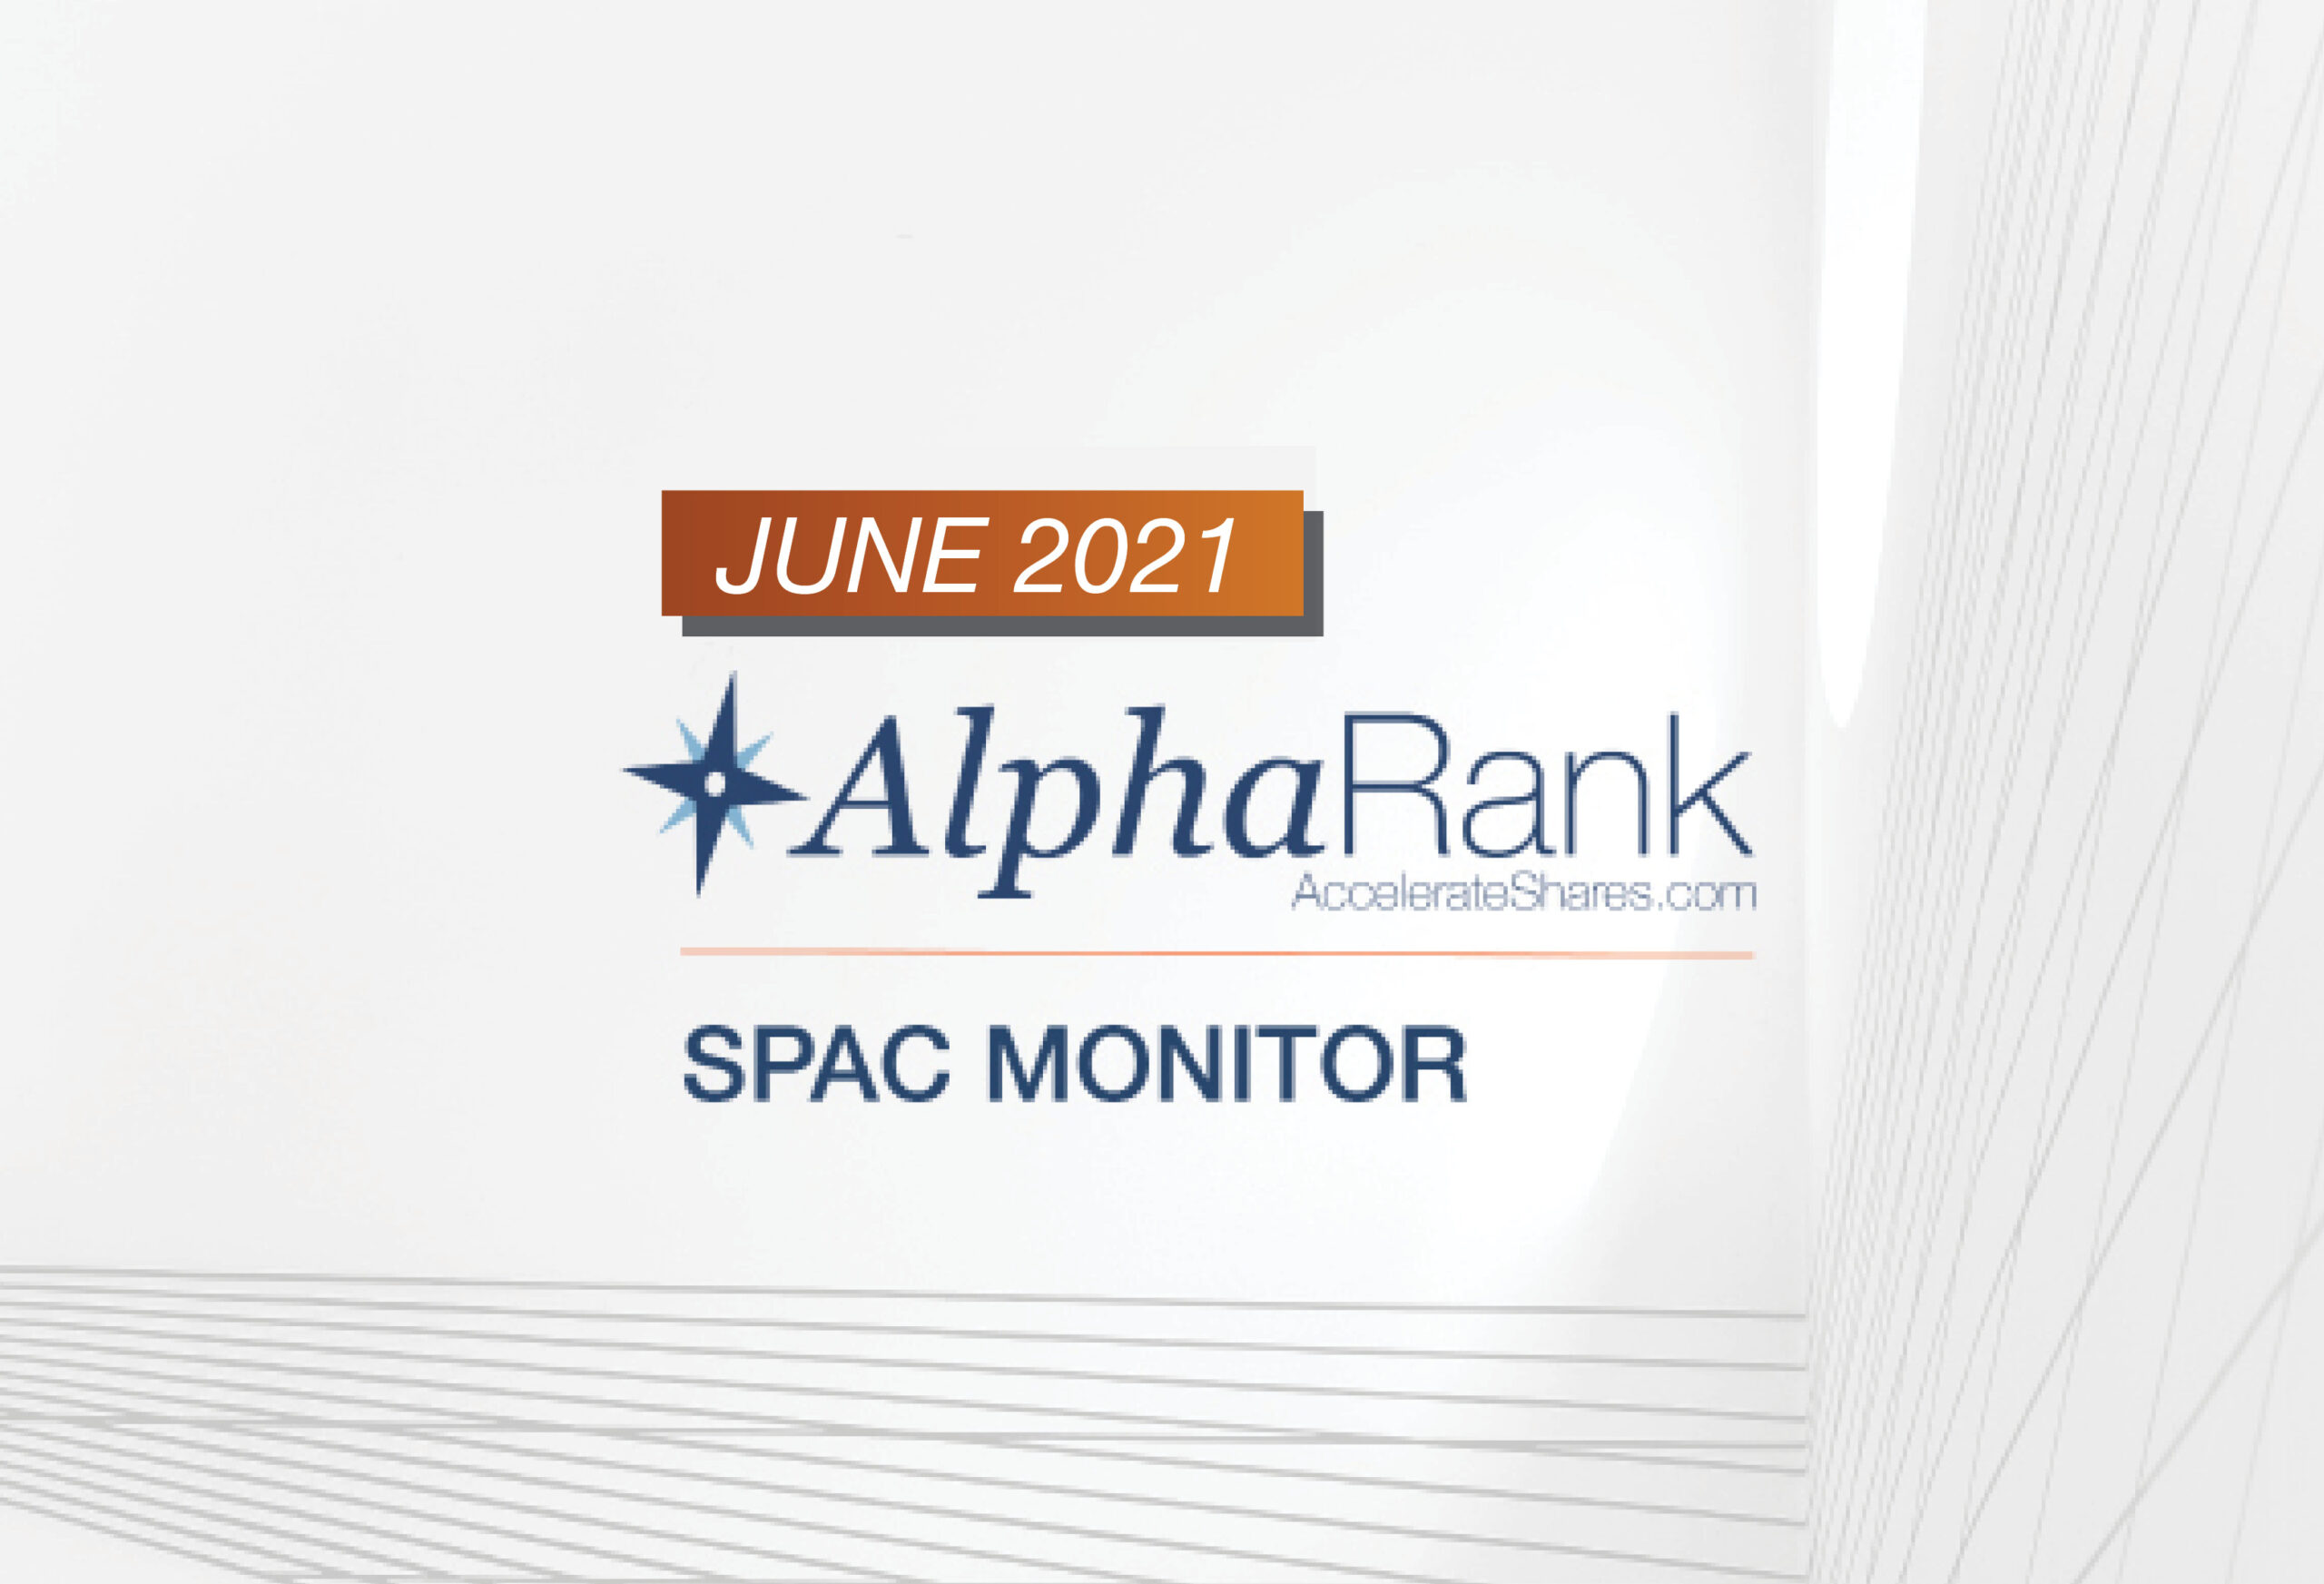 AlphaRank SPAC Monitor – June 2021